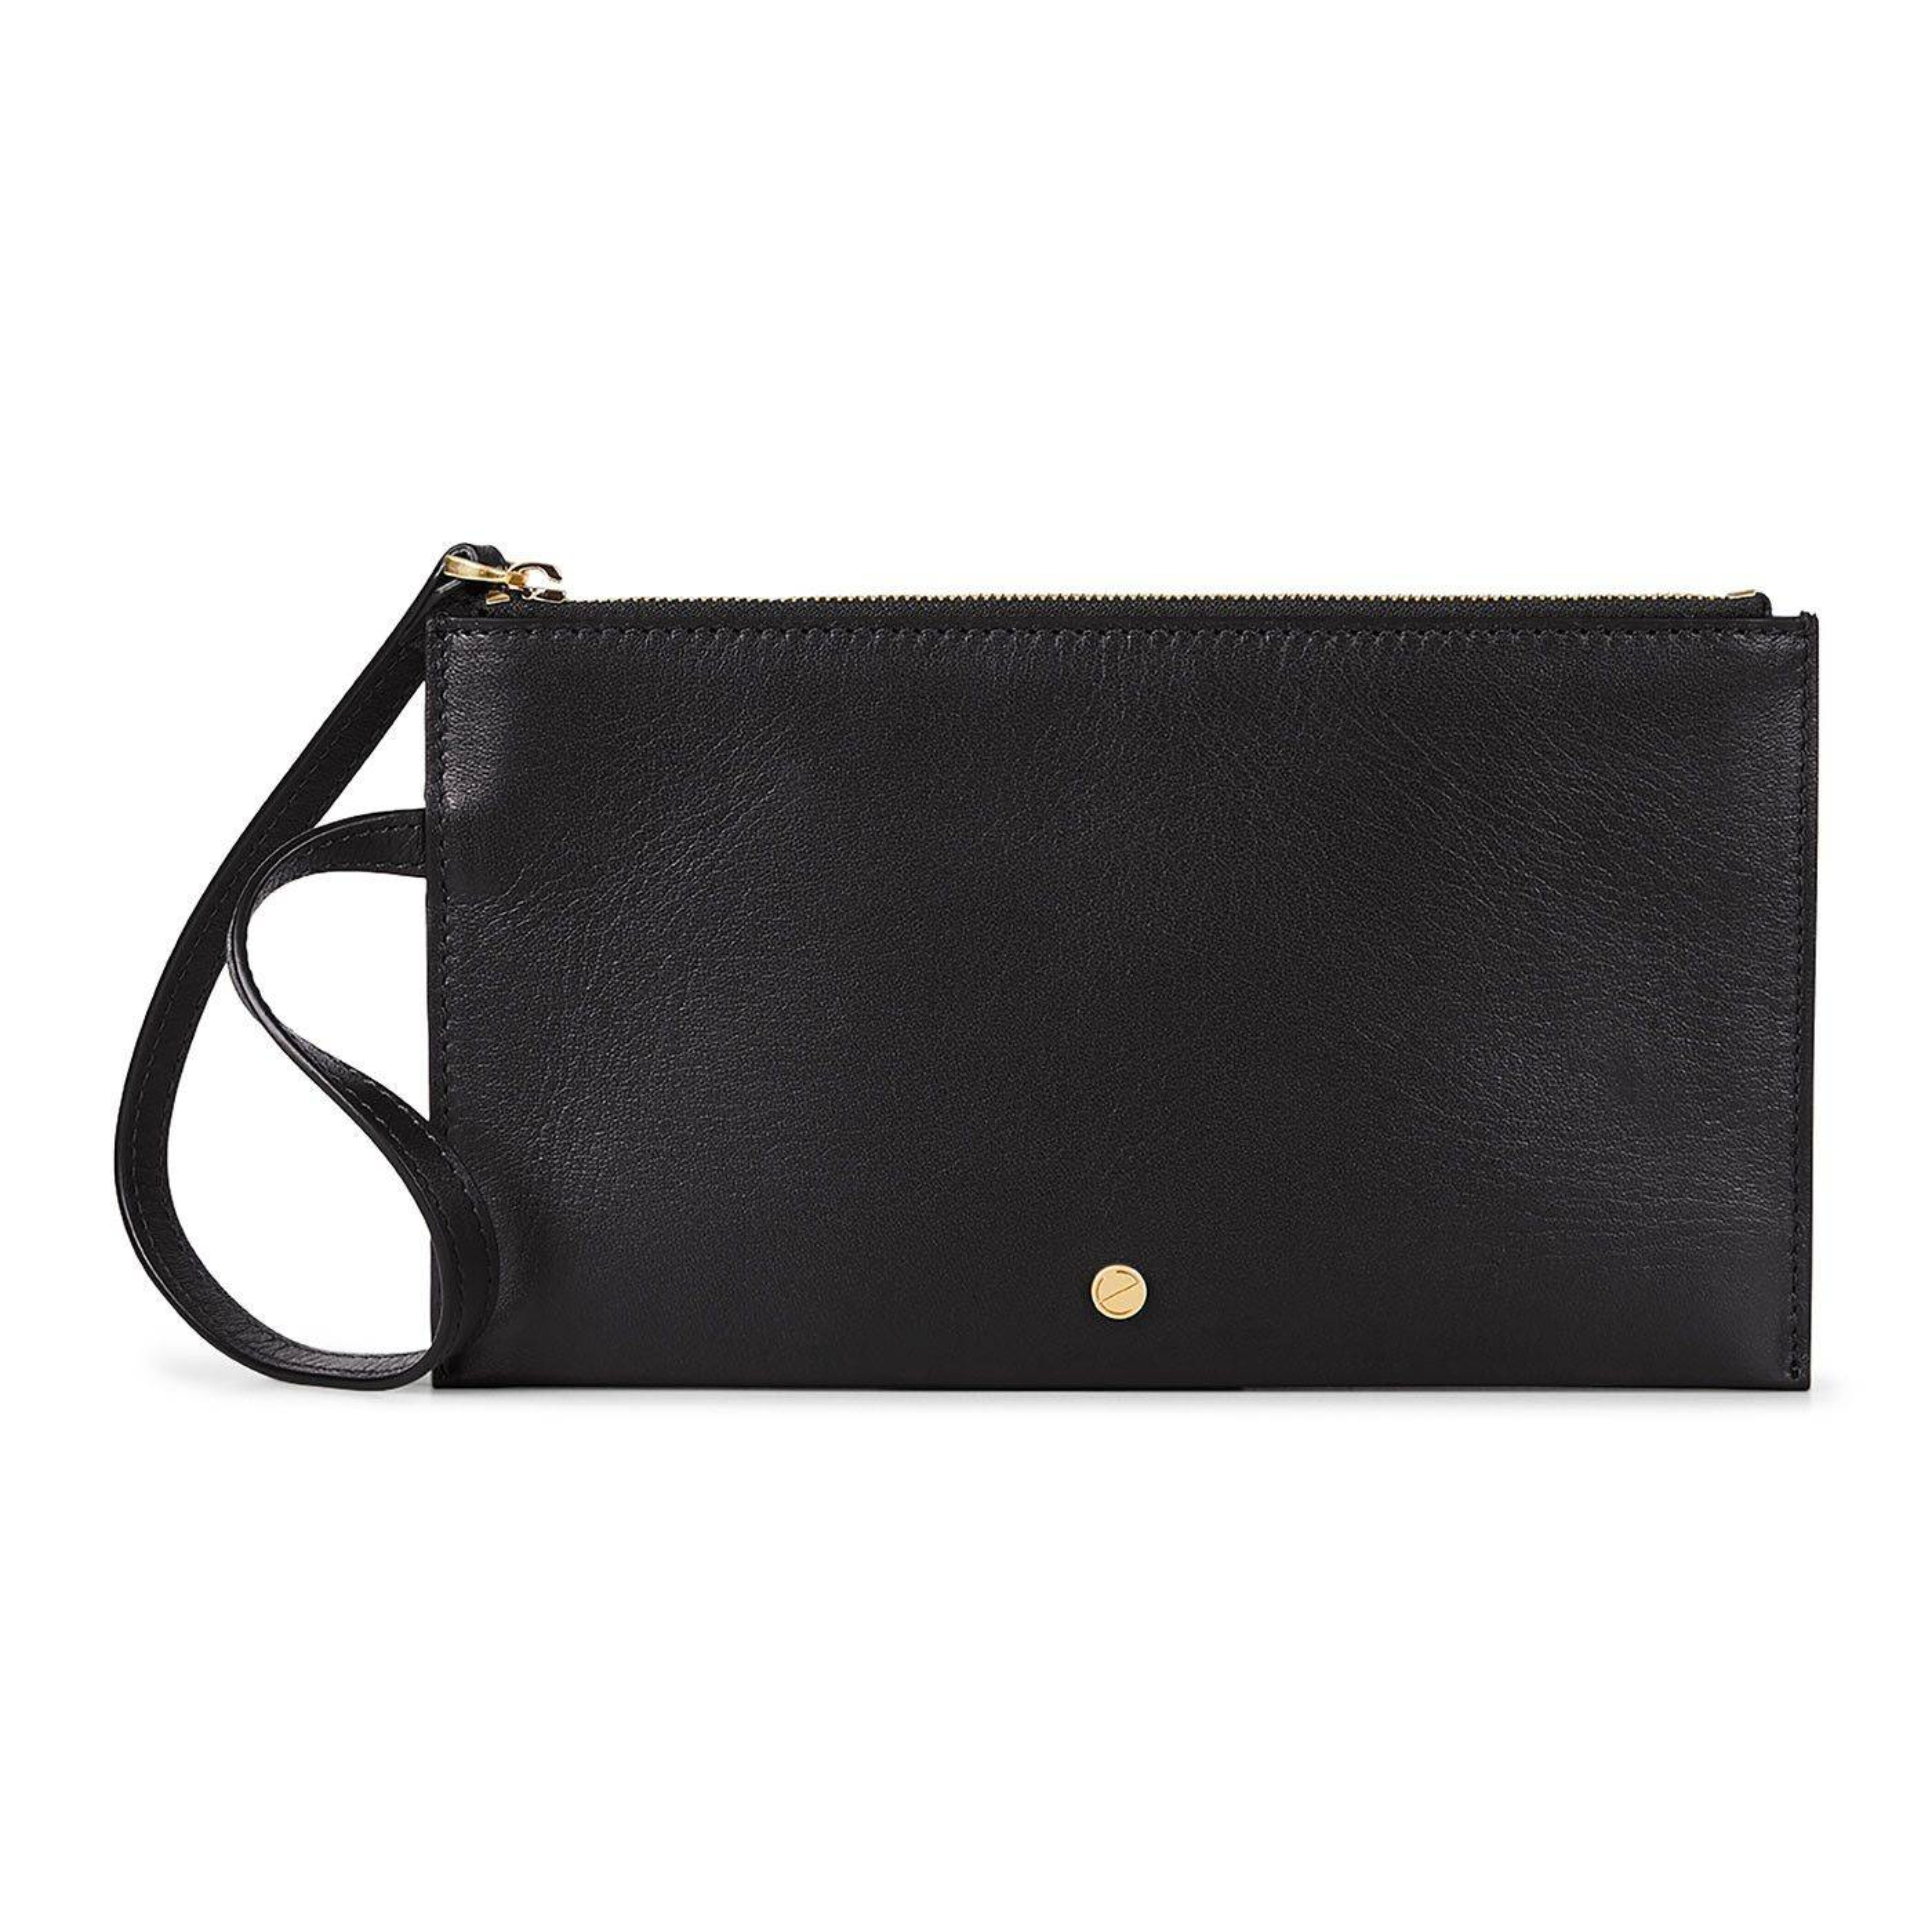 ECCO Sculptured Pouch Wallet: One Size - Black